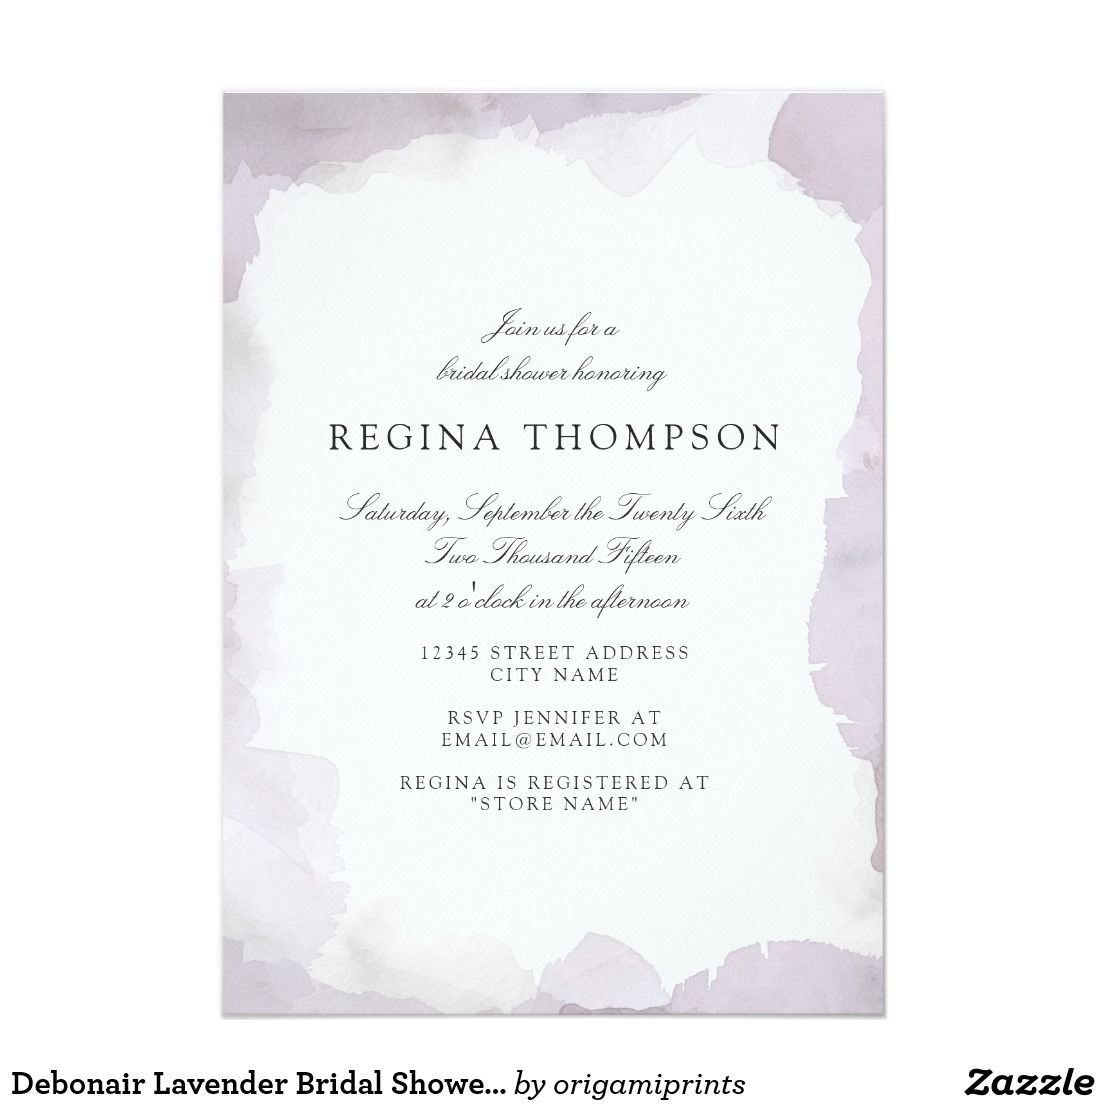 Debonair Lavender Bridal Shower Invitation | Wedding Thank You Cards ...